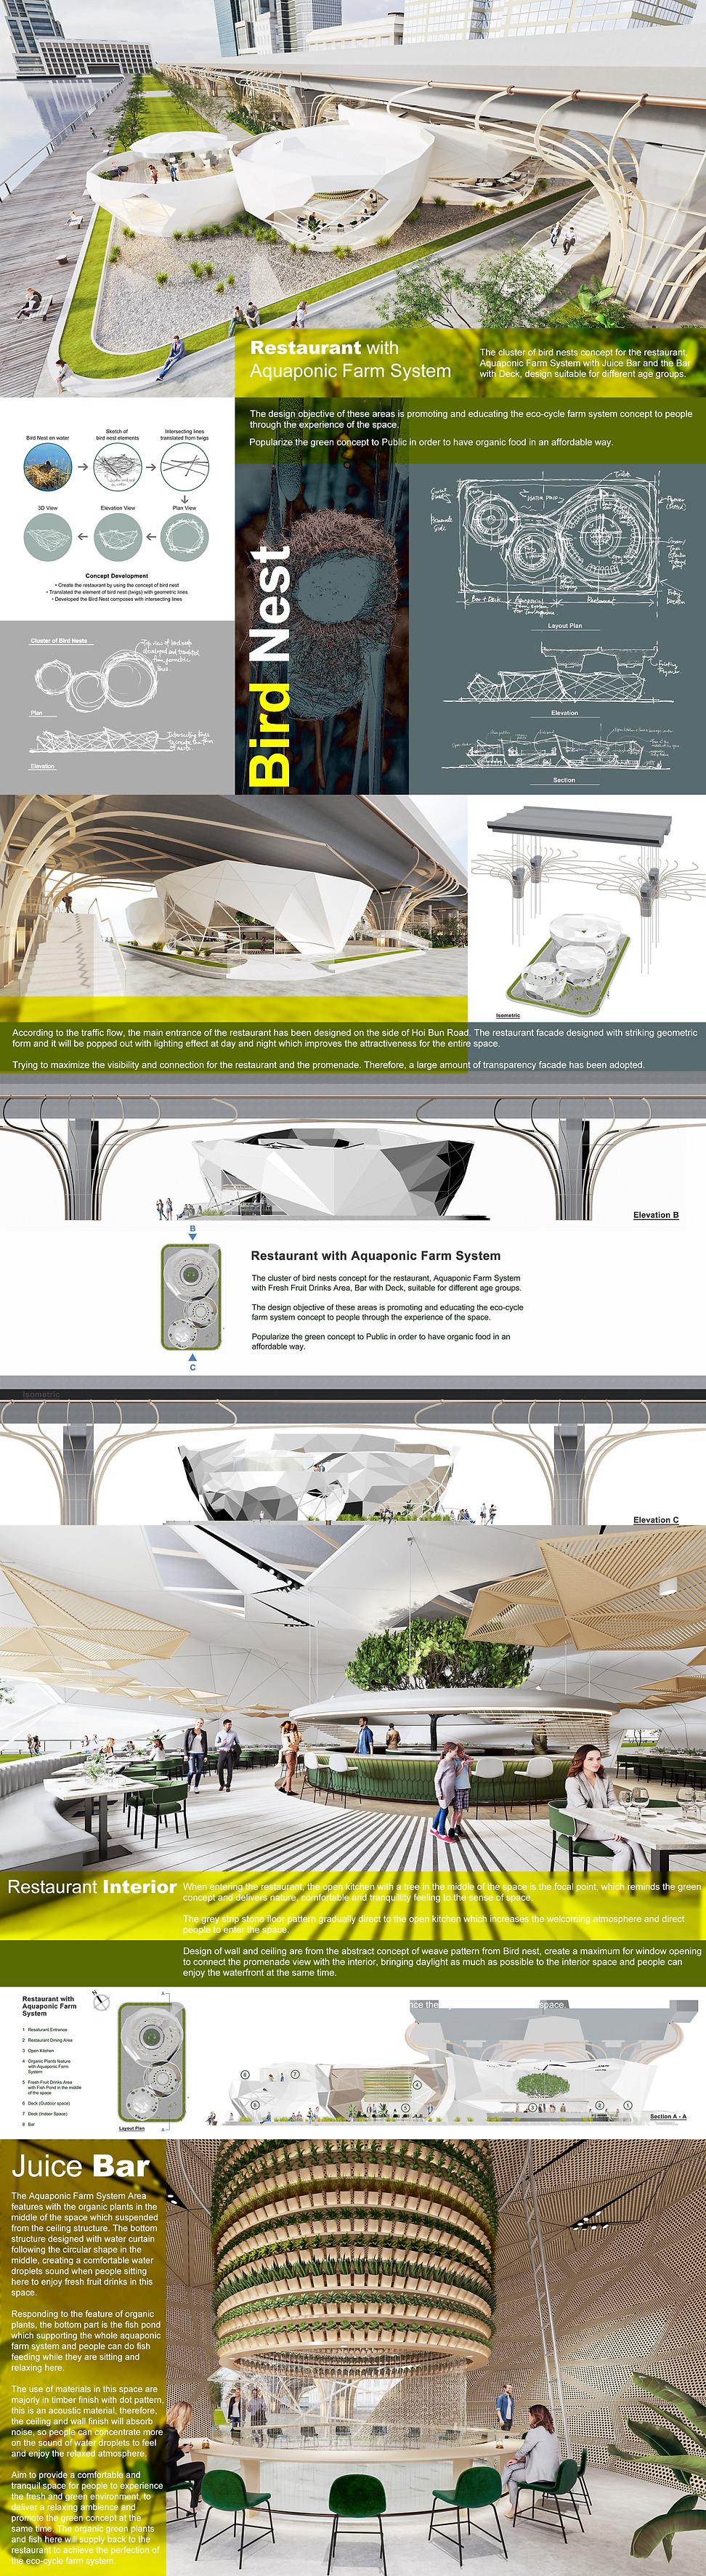 web_part1.jpg